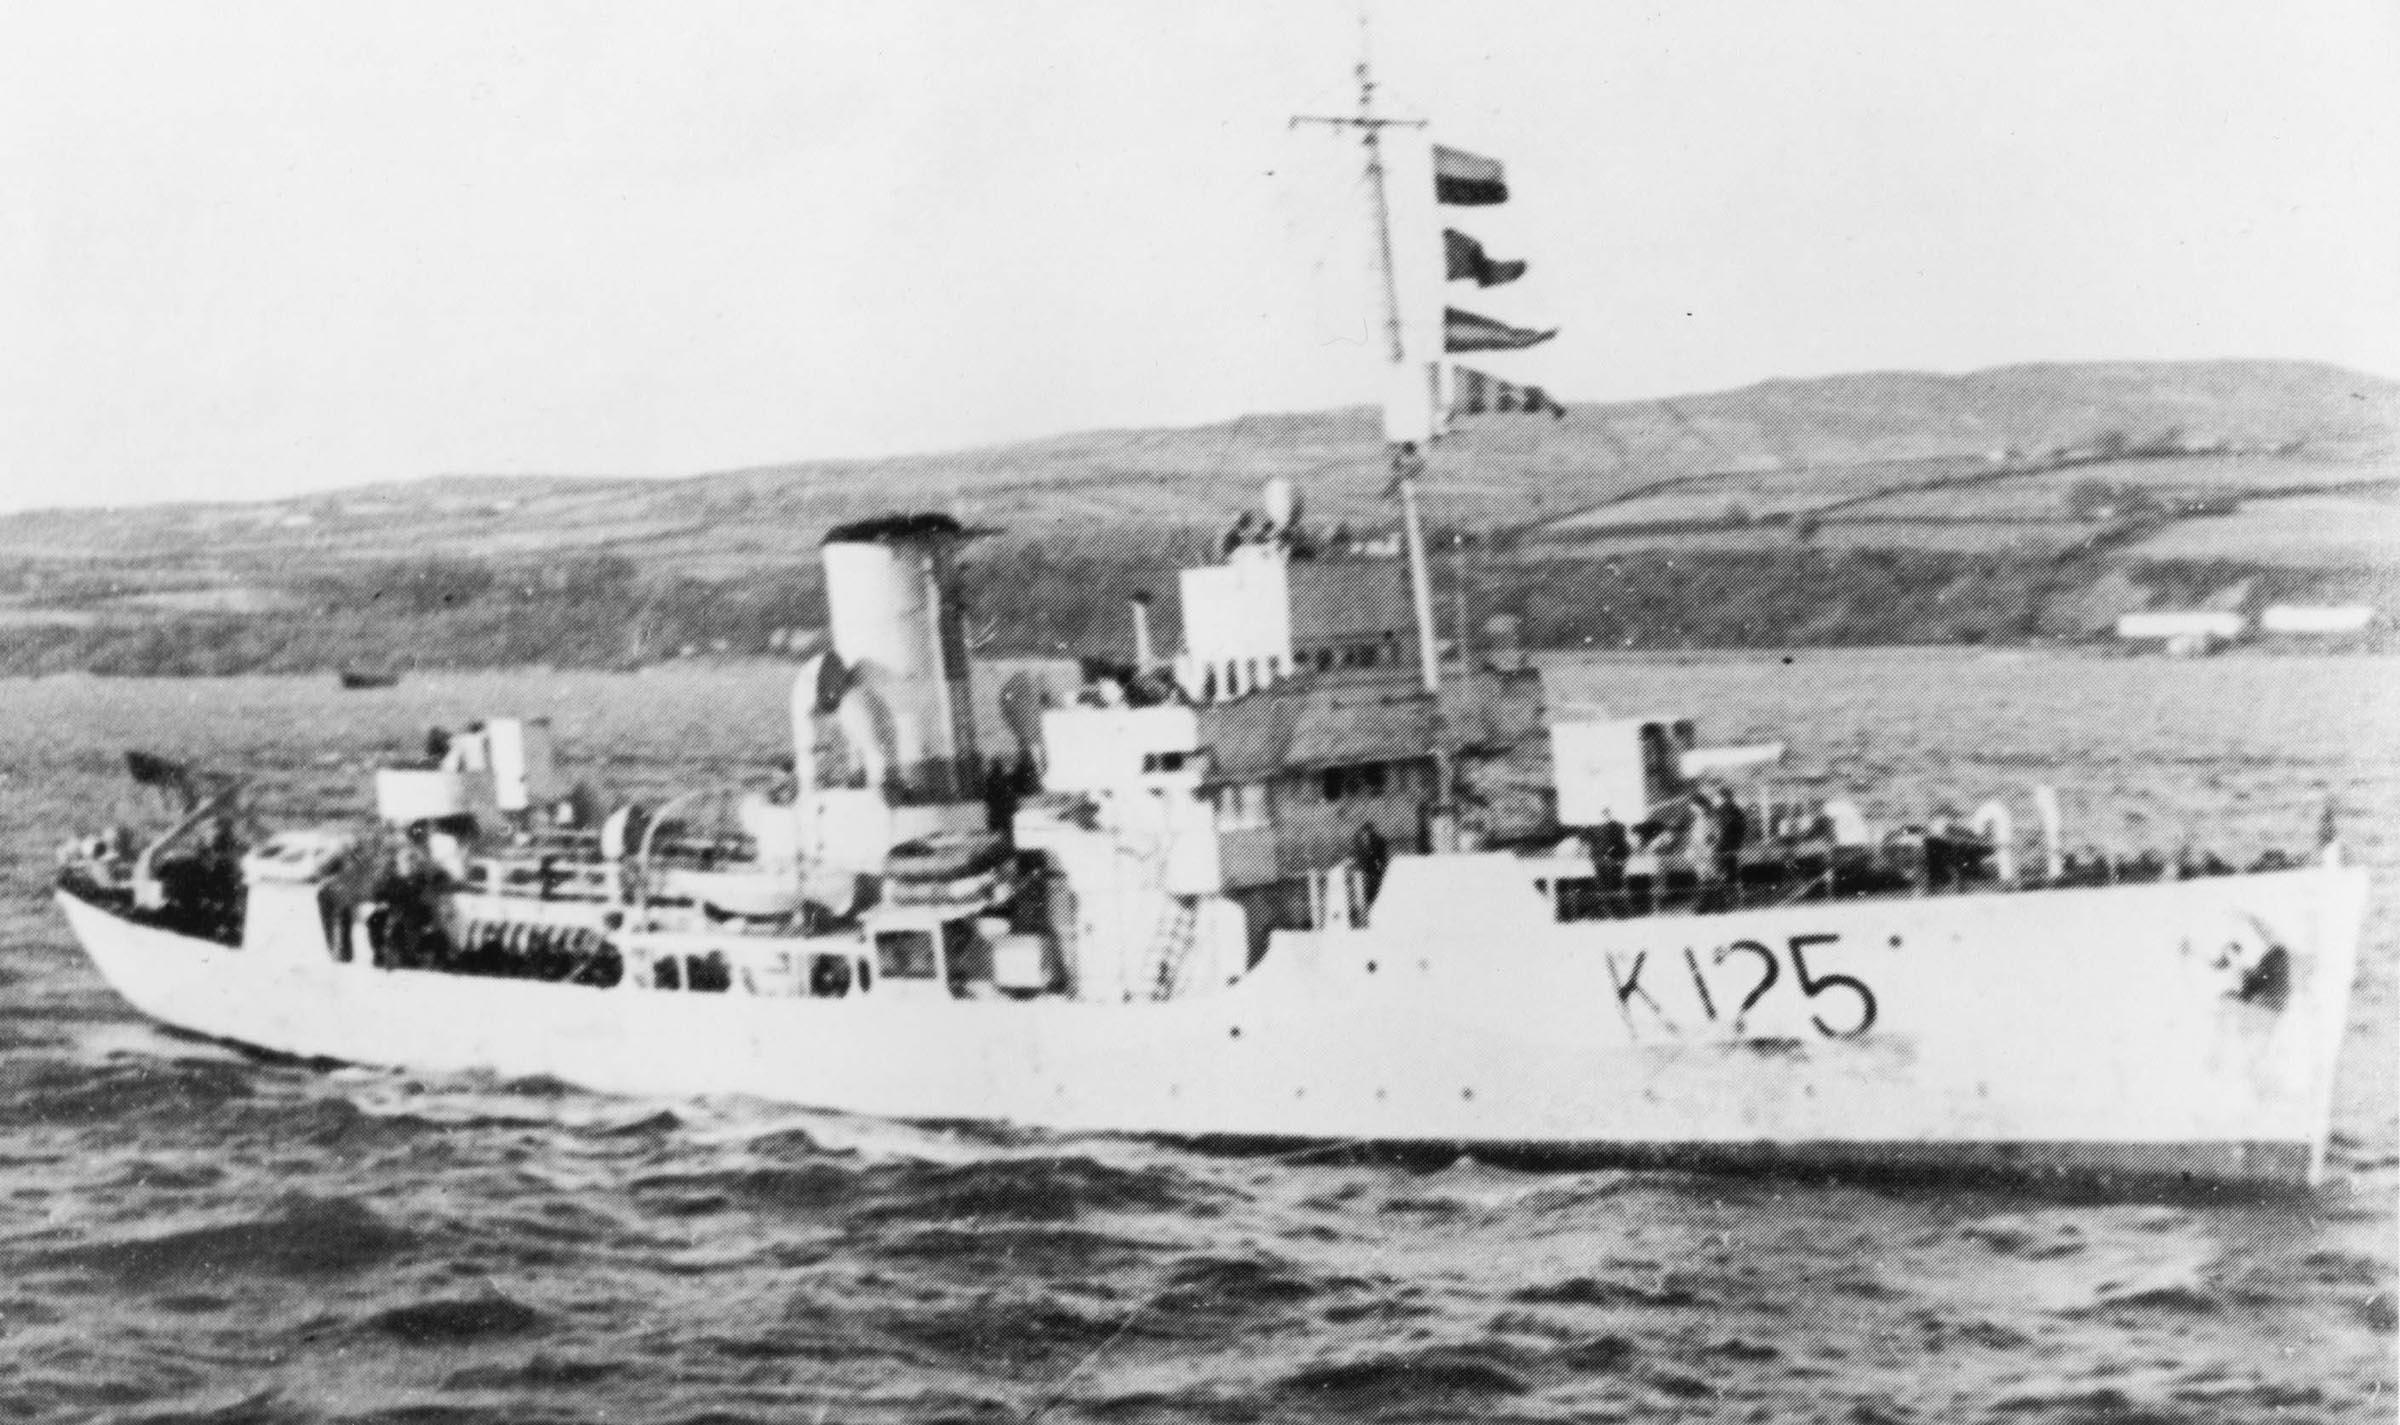 HMCS KENOGAMI